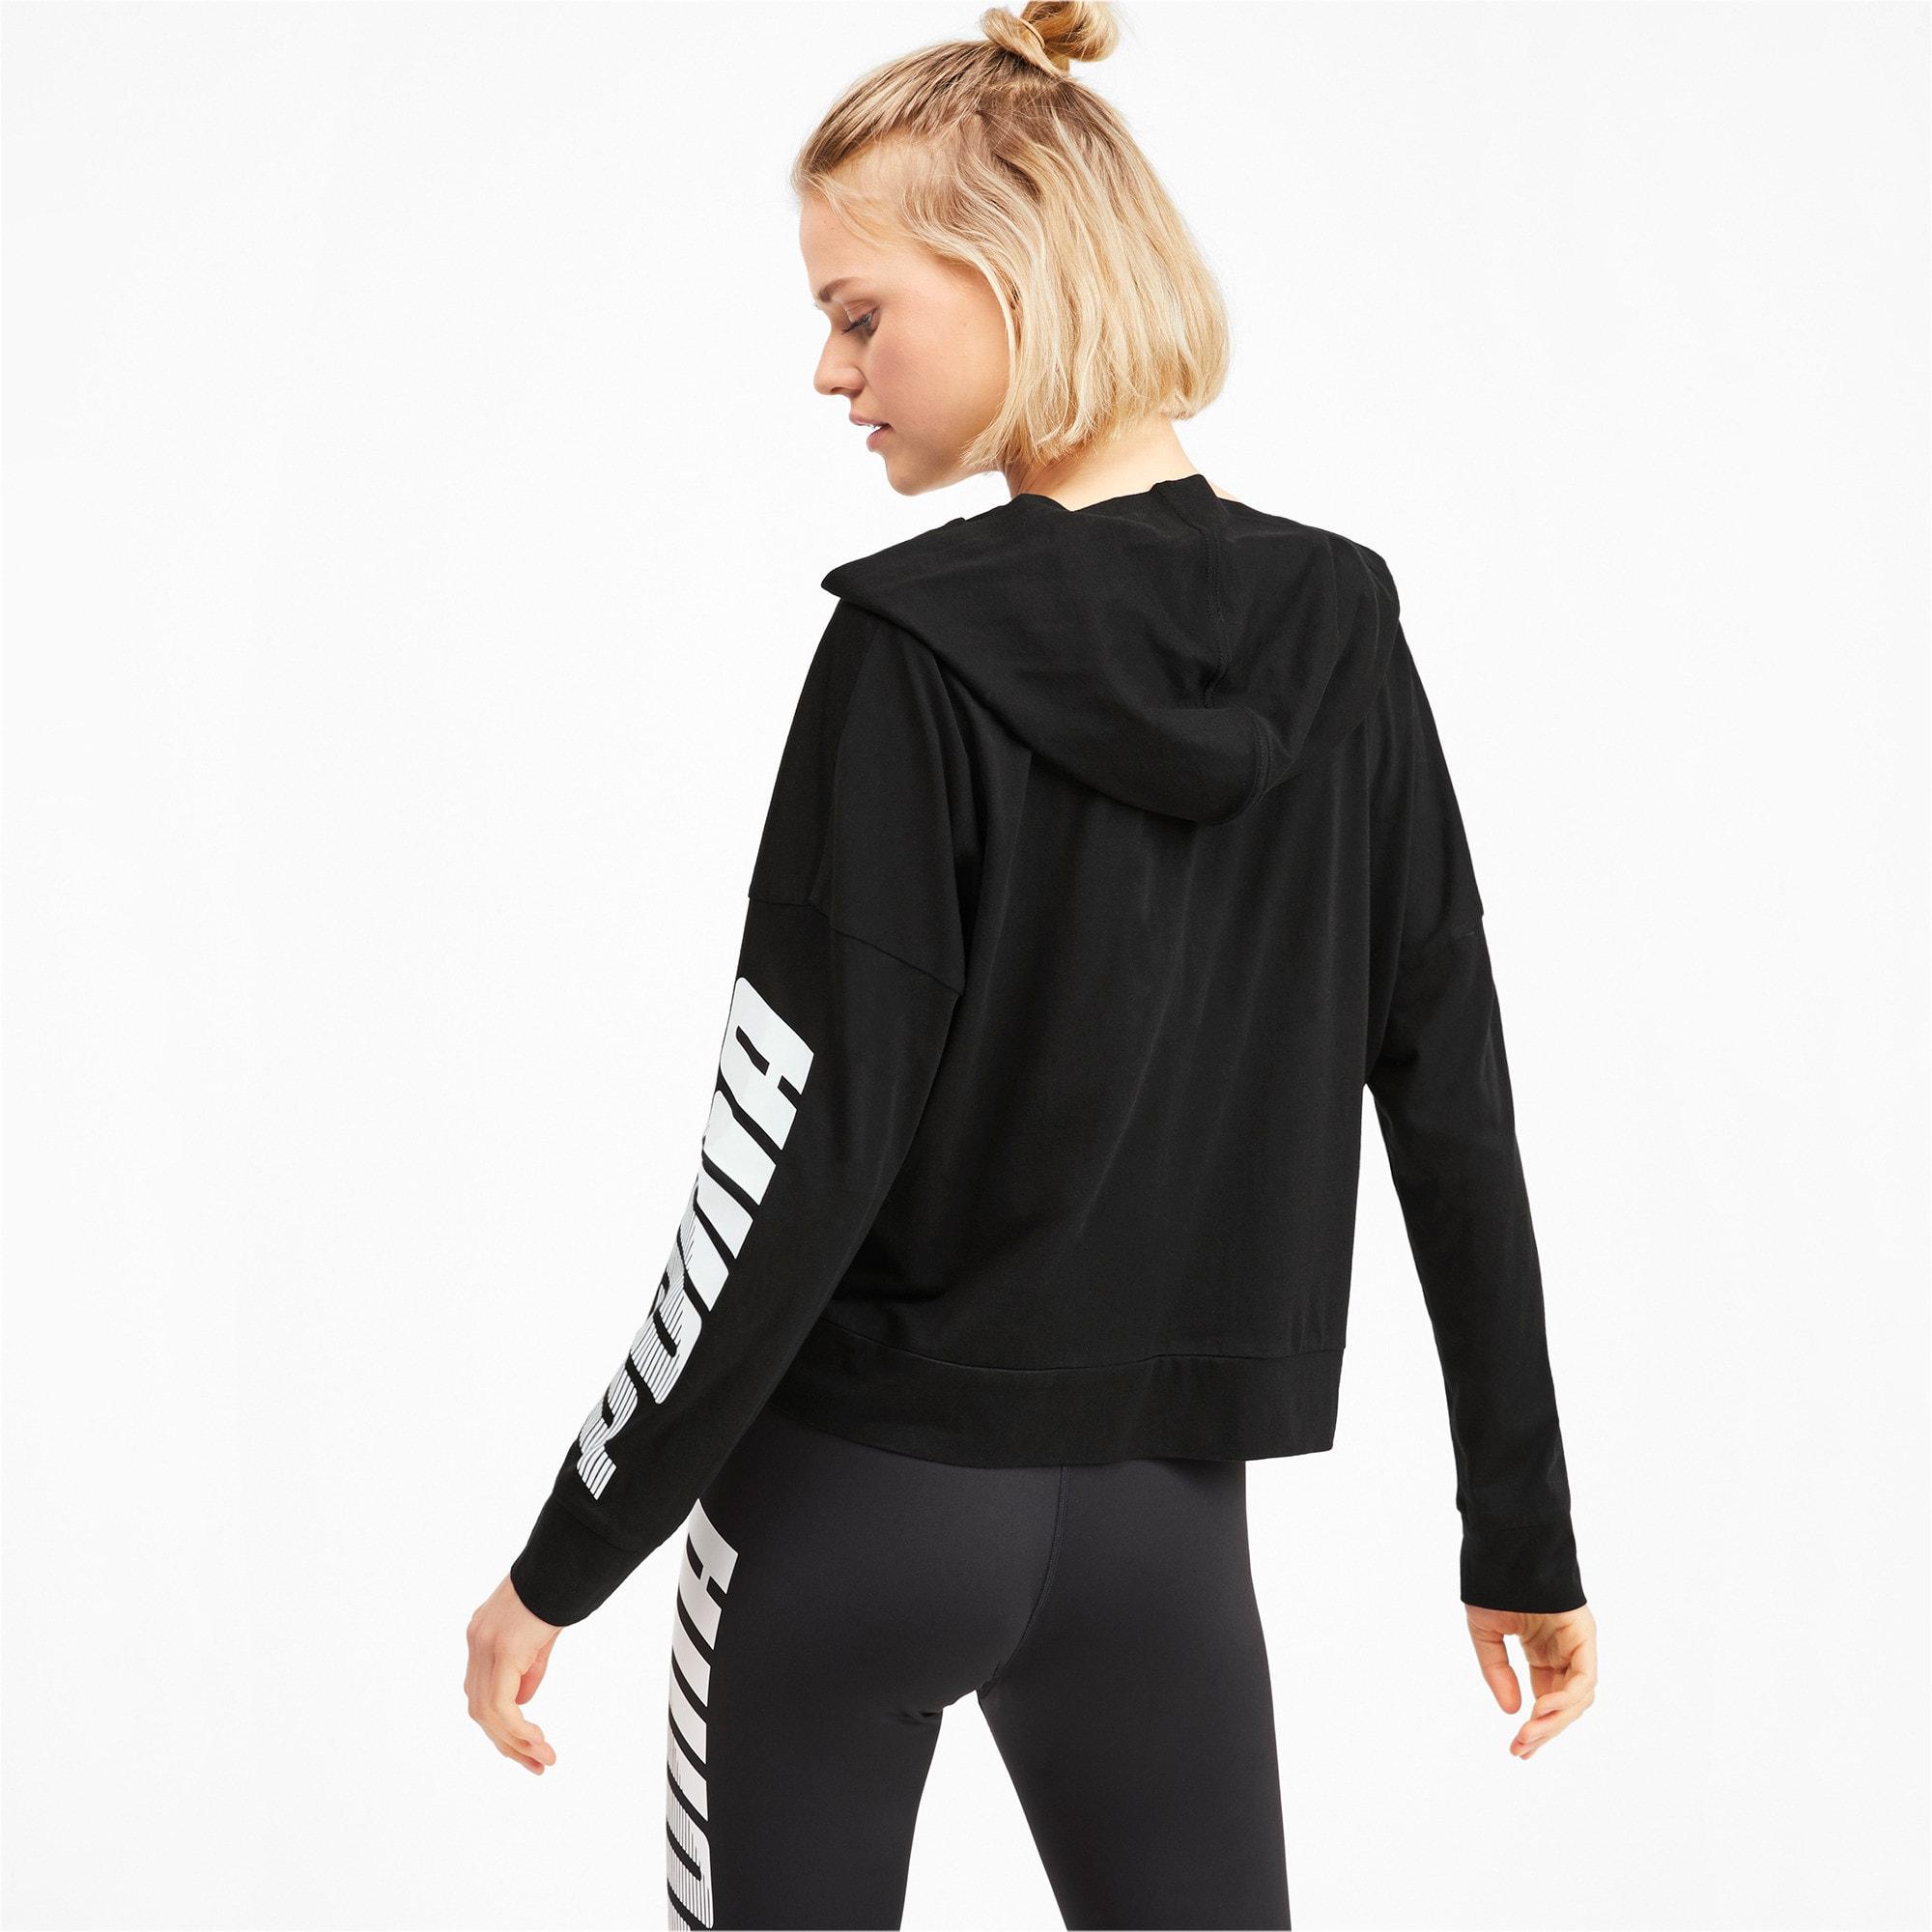 Thumbnail 3 of Modern Sport Long Sleeve Women's Hoodie, Puma Black, medium-IND